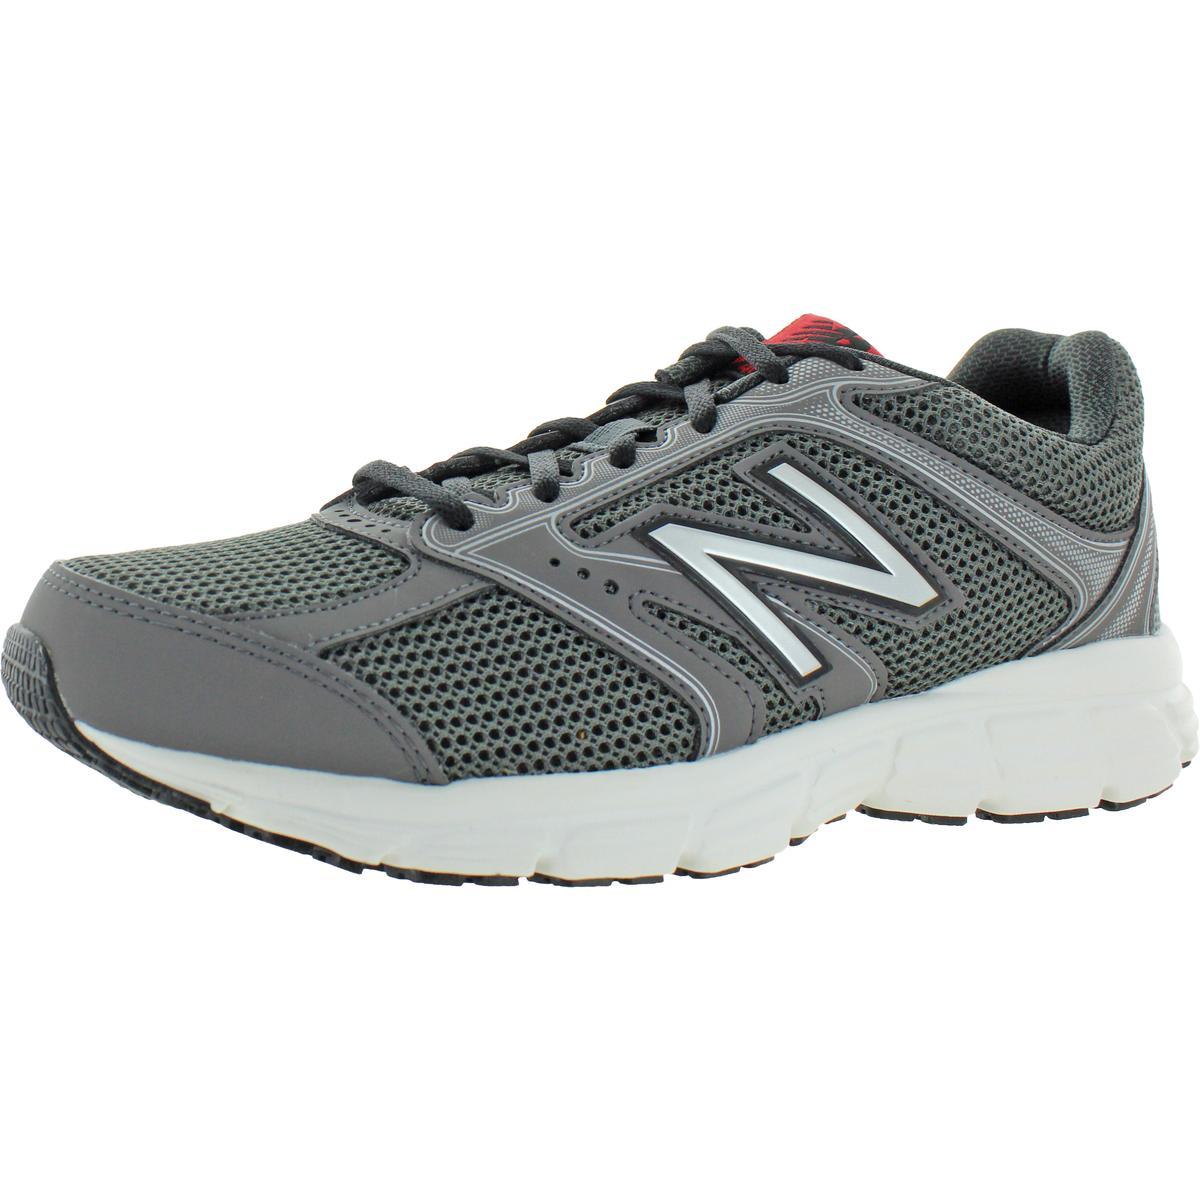 New Balance Mens 460 V2 Lifestyle